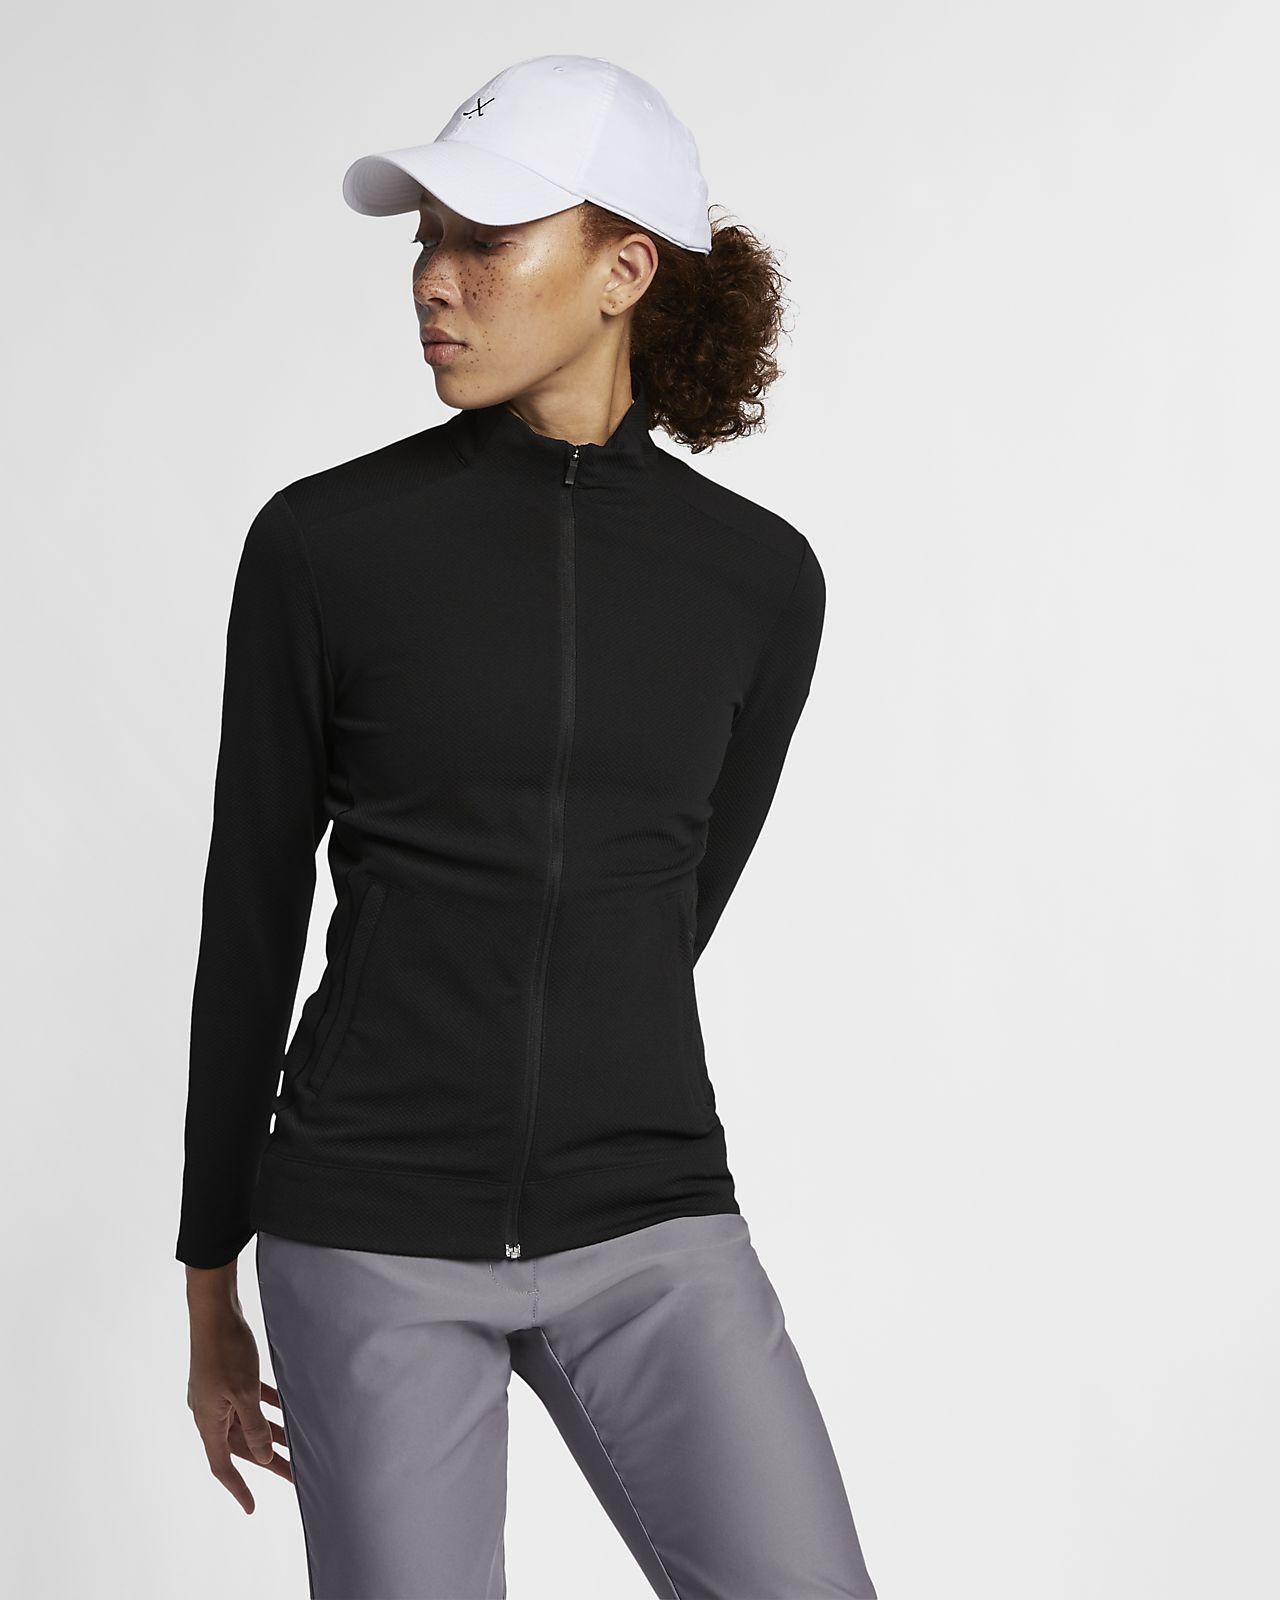 Nike Dri-FIT UV golfjakke til dame